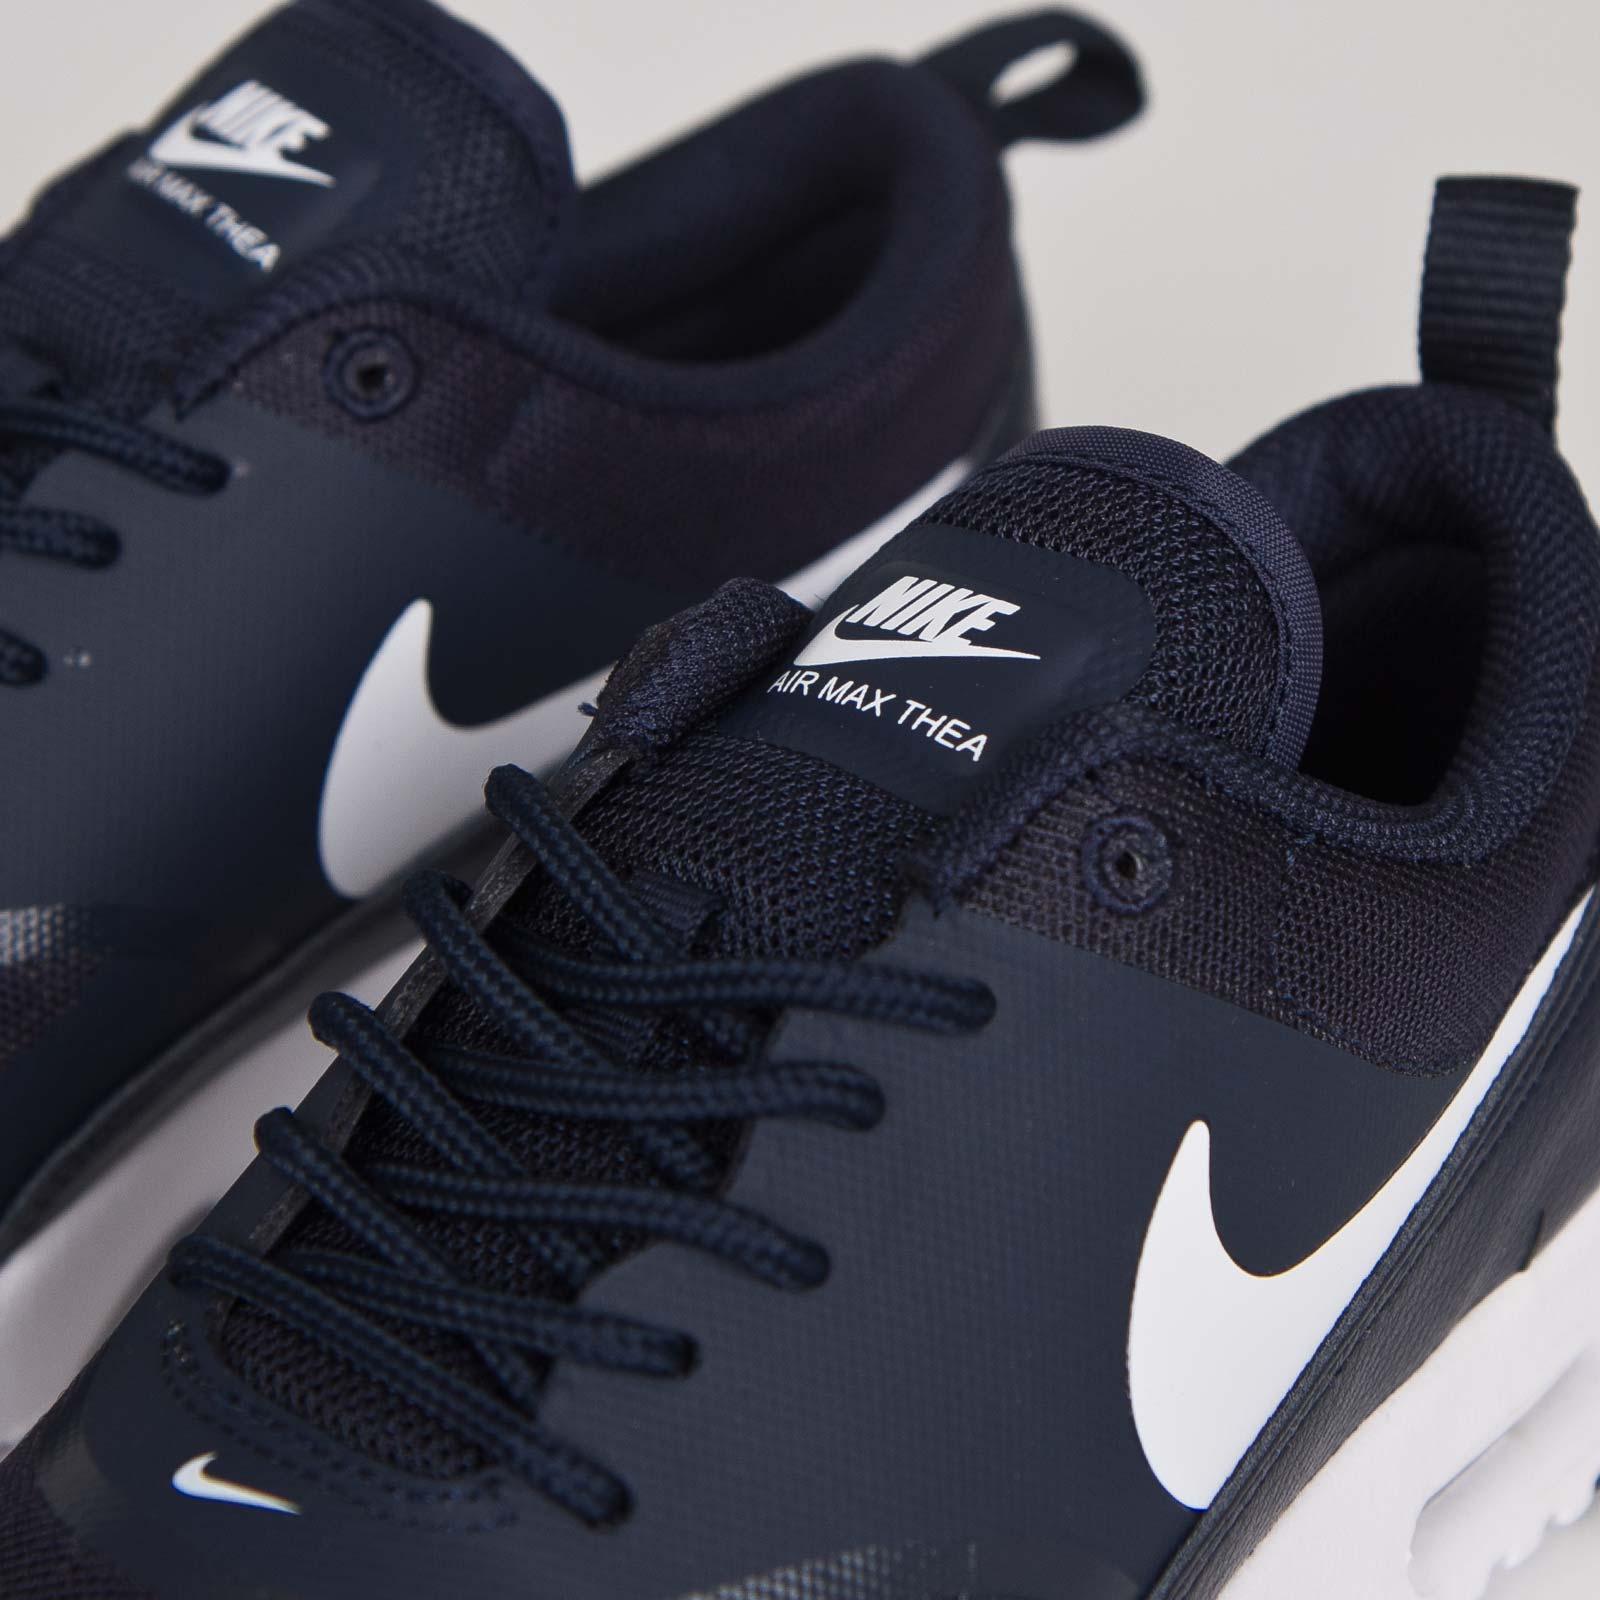 reputable site cf2e9 b39d8 Nike Air Max Thea - 599409-409 - Sneakersnstuff   sneakers   streetwear  online since 1999